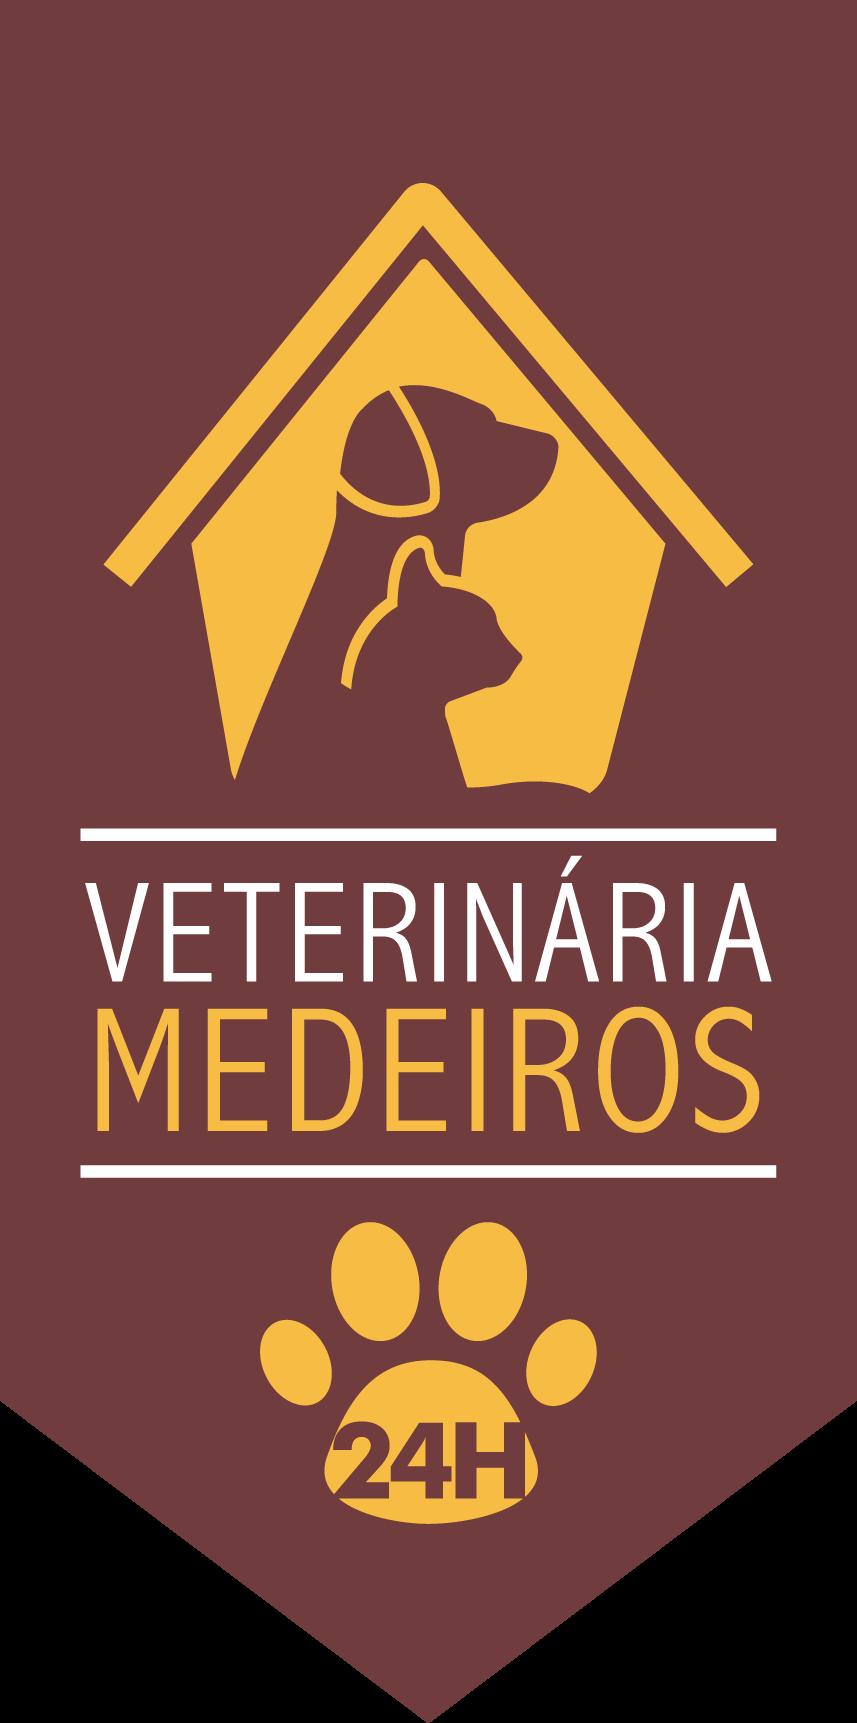 Veterinária Medeiros